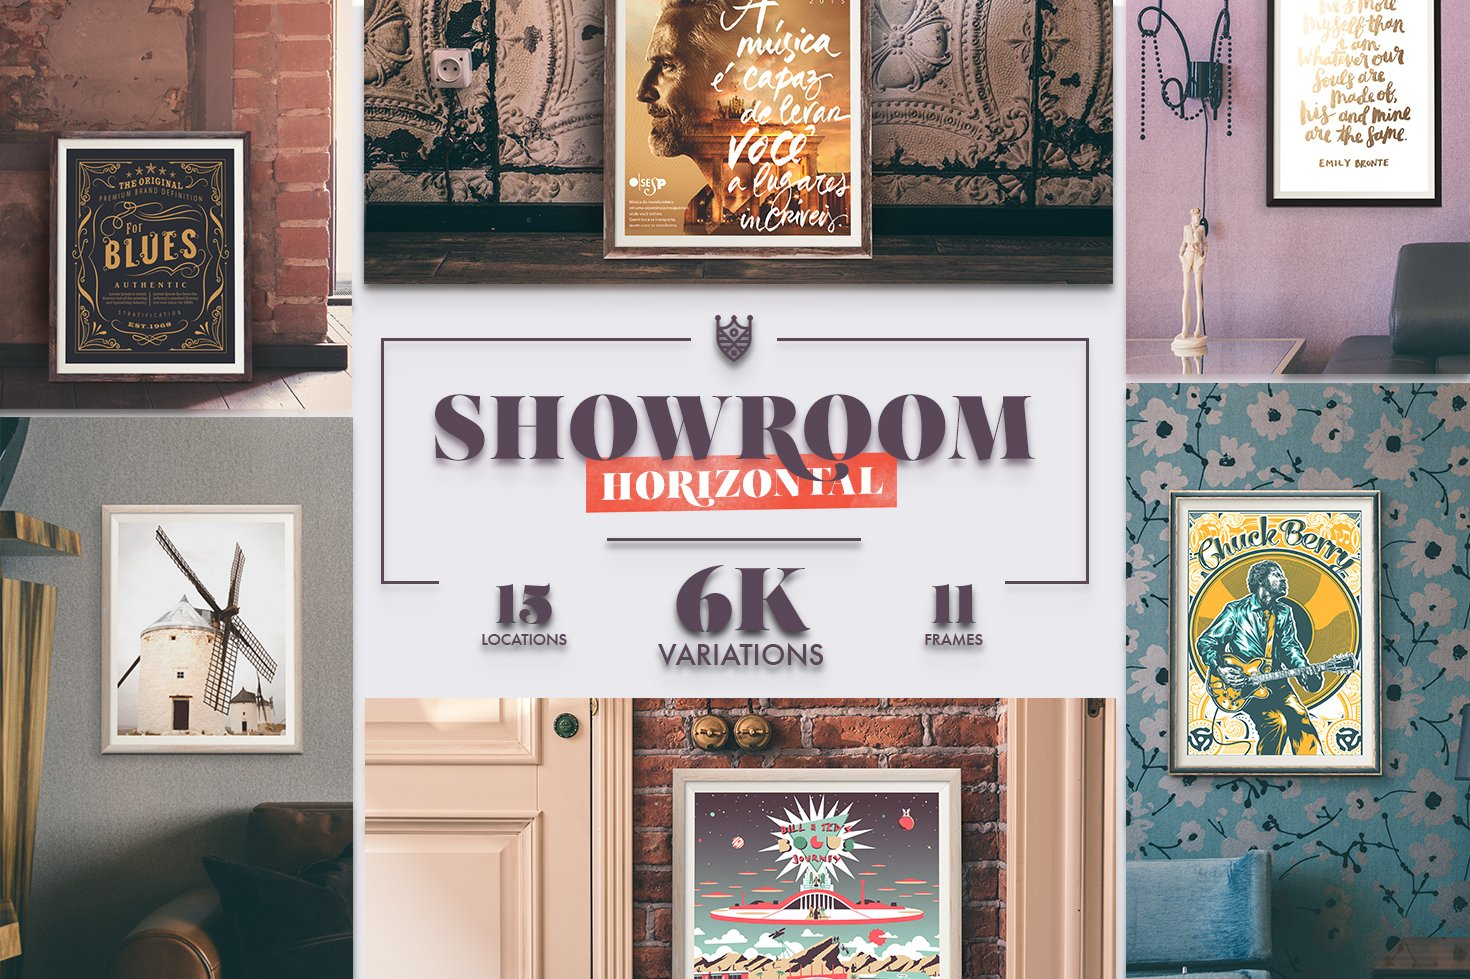 Showroom\